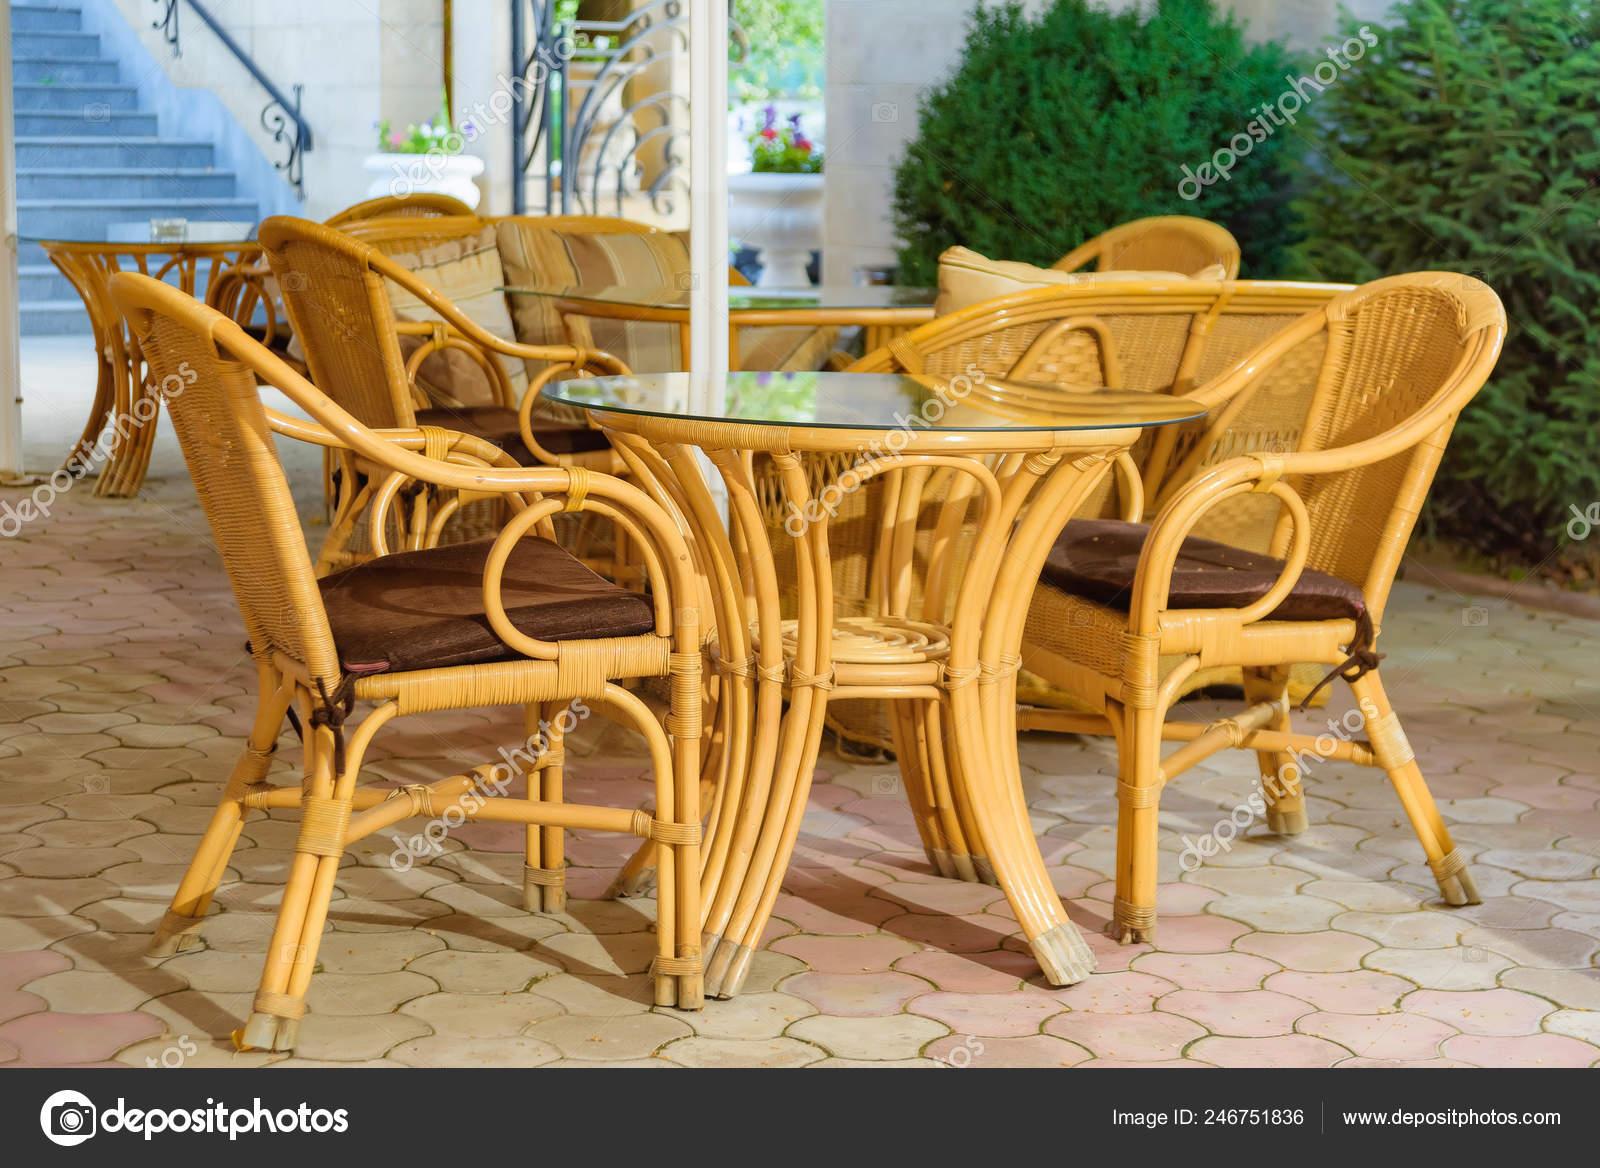 Wicker Furniture Summer Terrace Restaurant Decor Texture